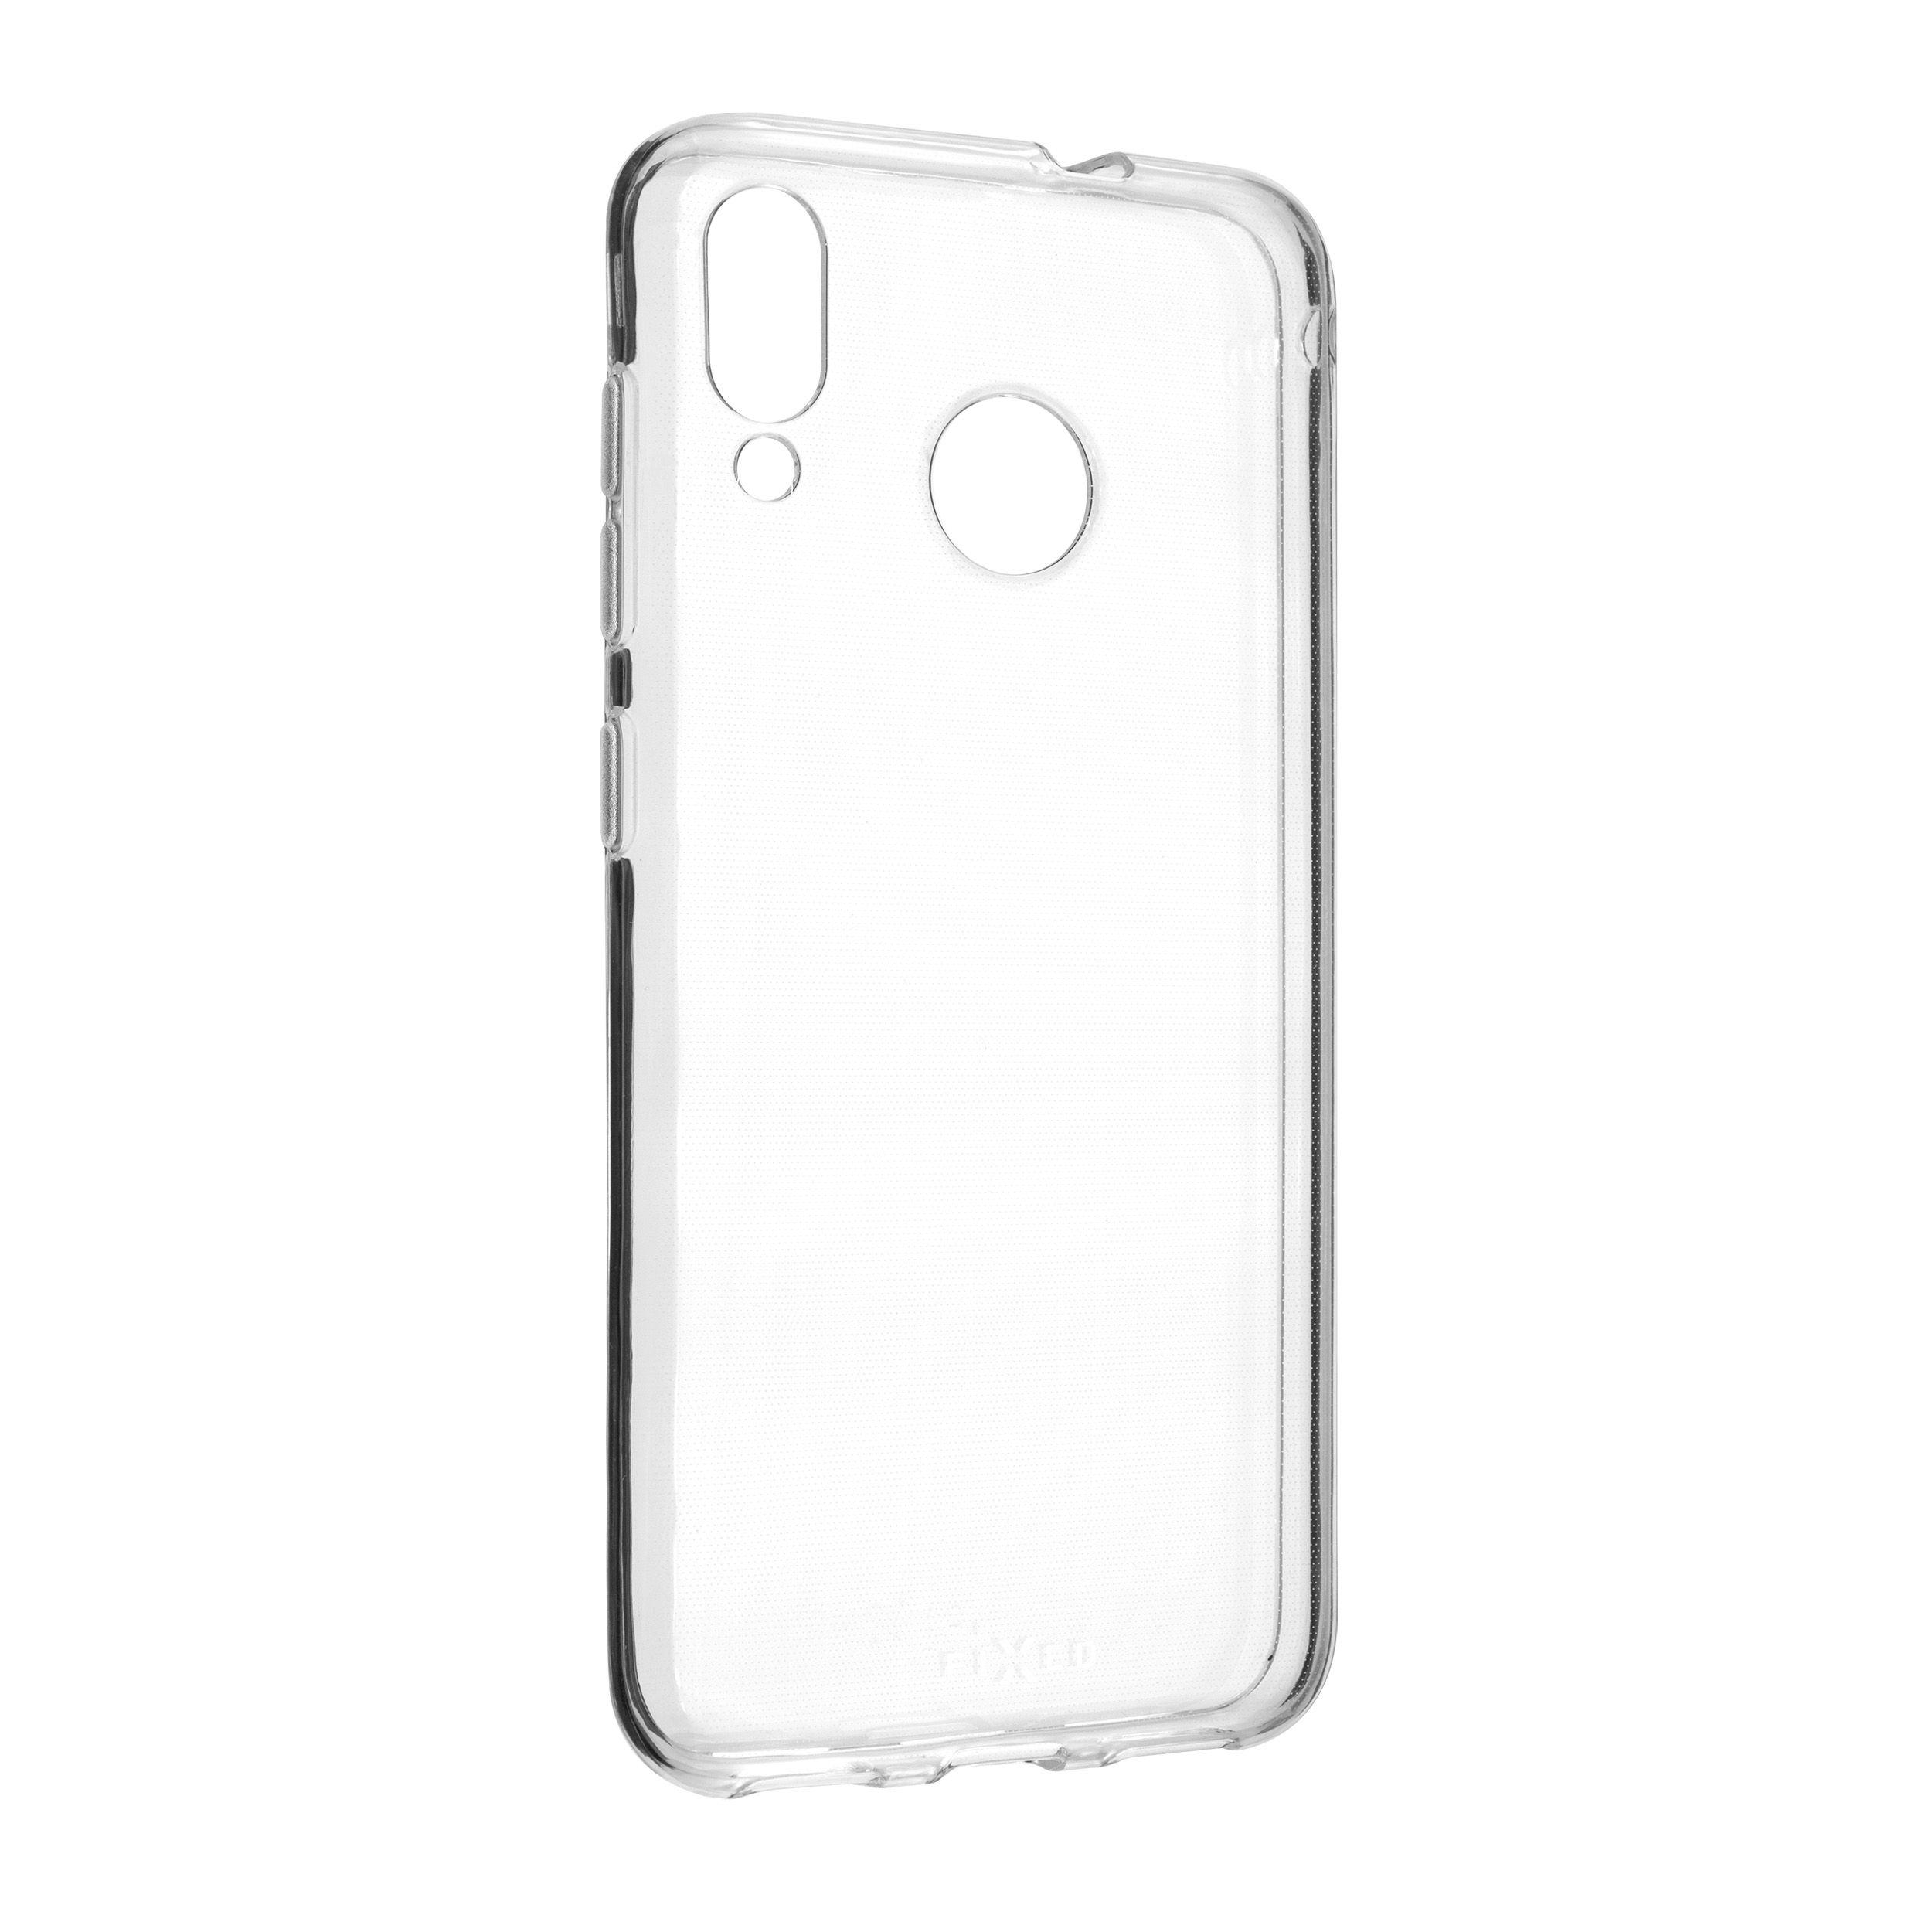 Ultratenké TPU gelové pouzdro FIXED Skin pro Asus Zenfone Max M1 (ZB555), 0,6 mm, čiré